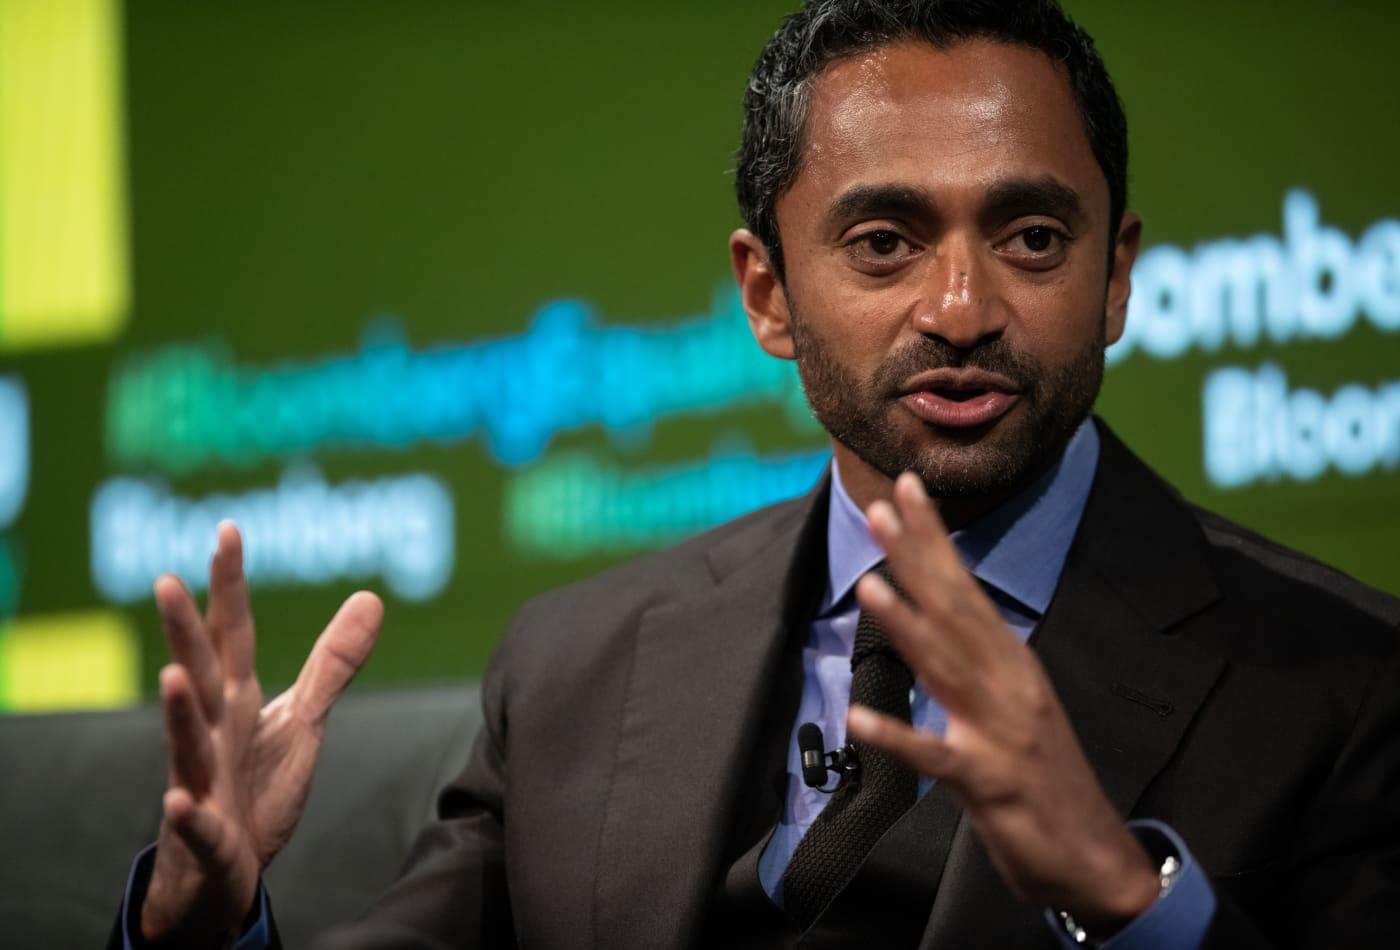 Billionaire investor Chamath Palihapitiya backs UK insurance start-up as it pivots from drones to cars